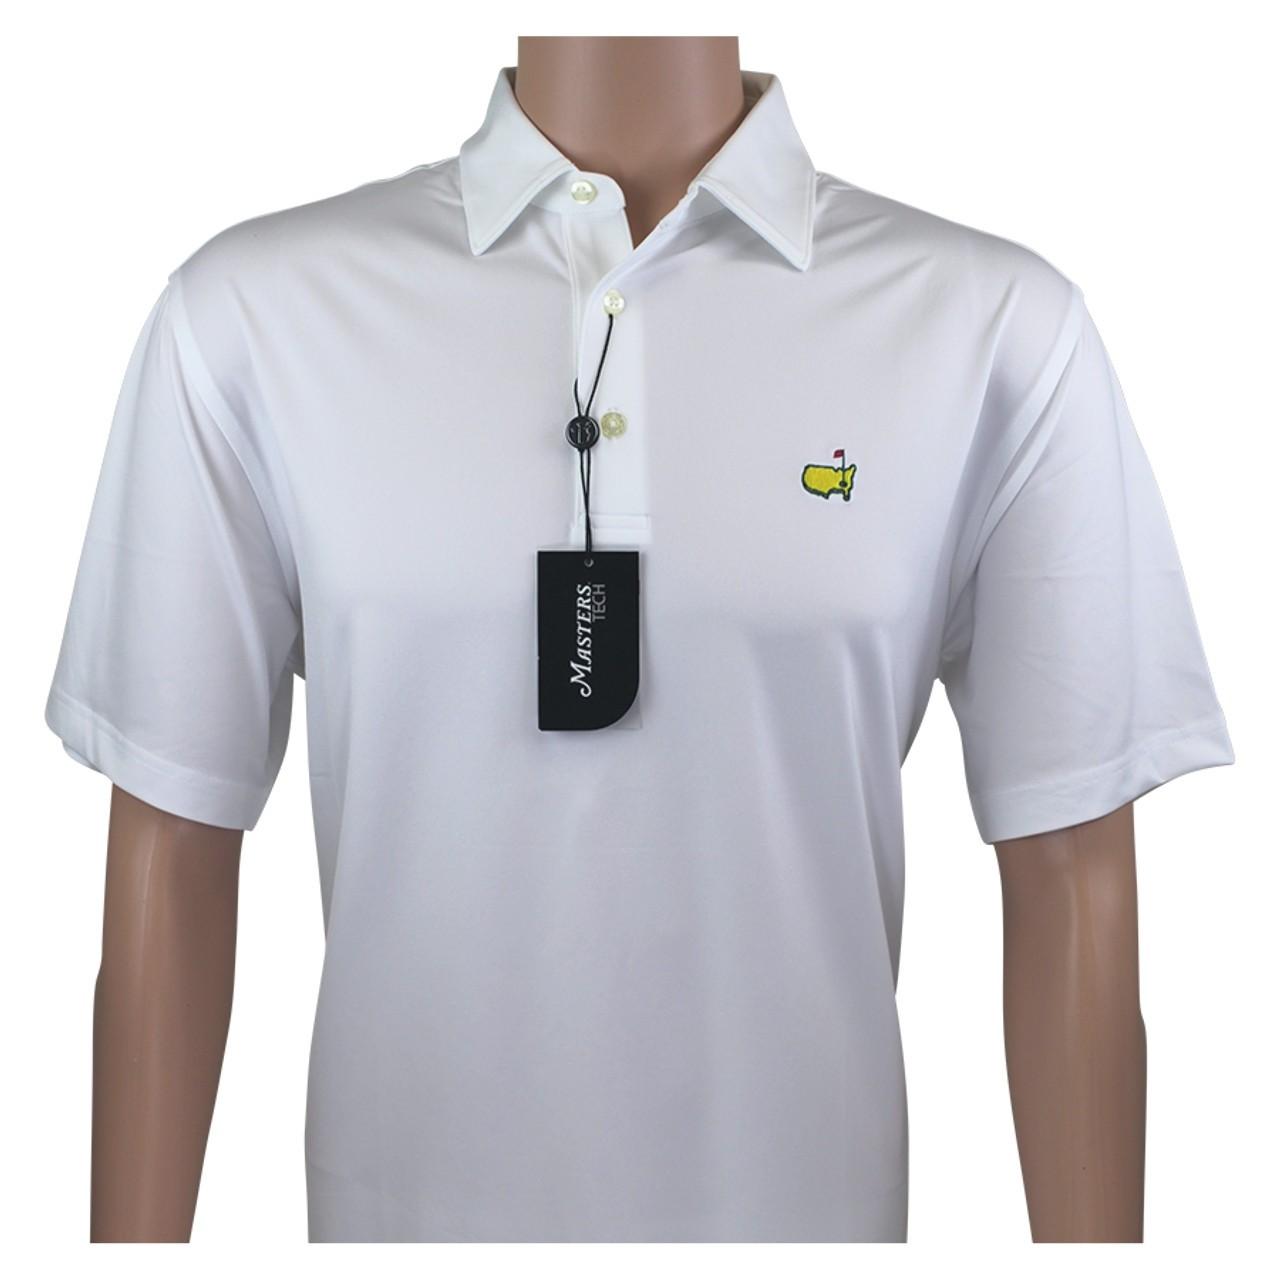 32272e17883 Masters White Performance Golf Shirt